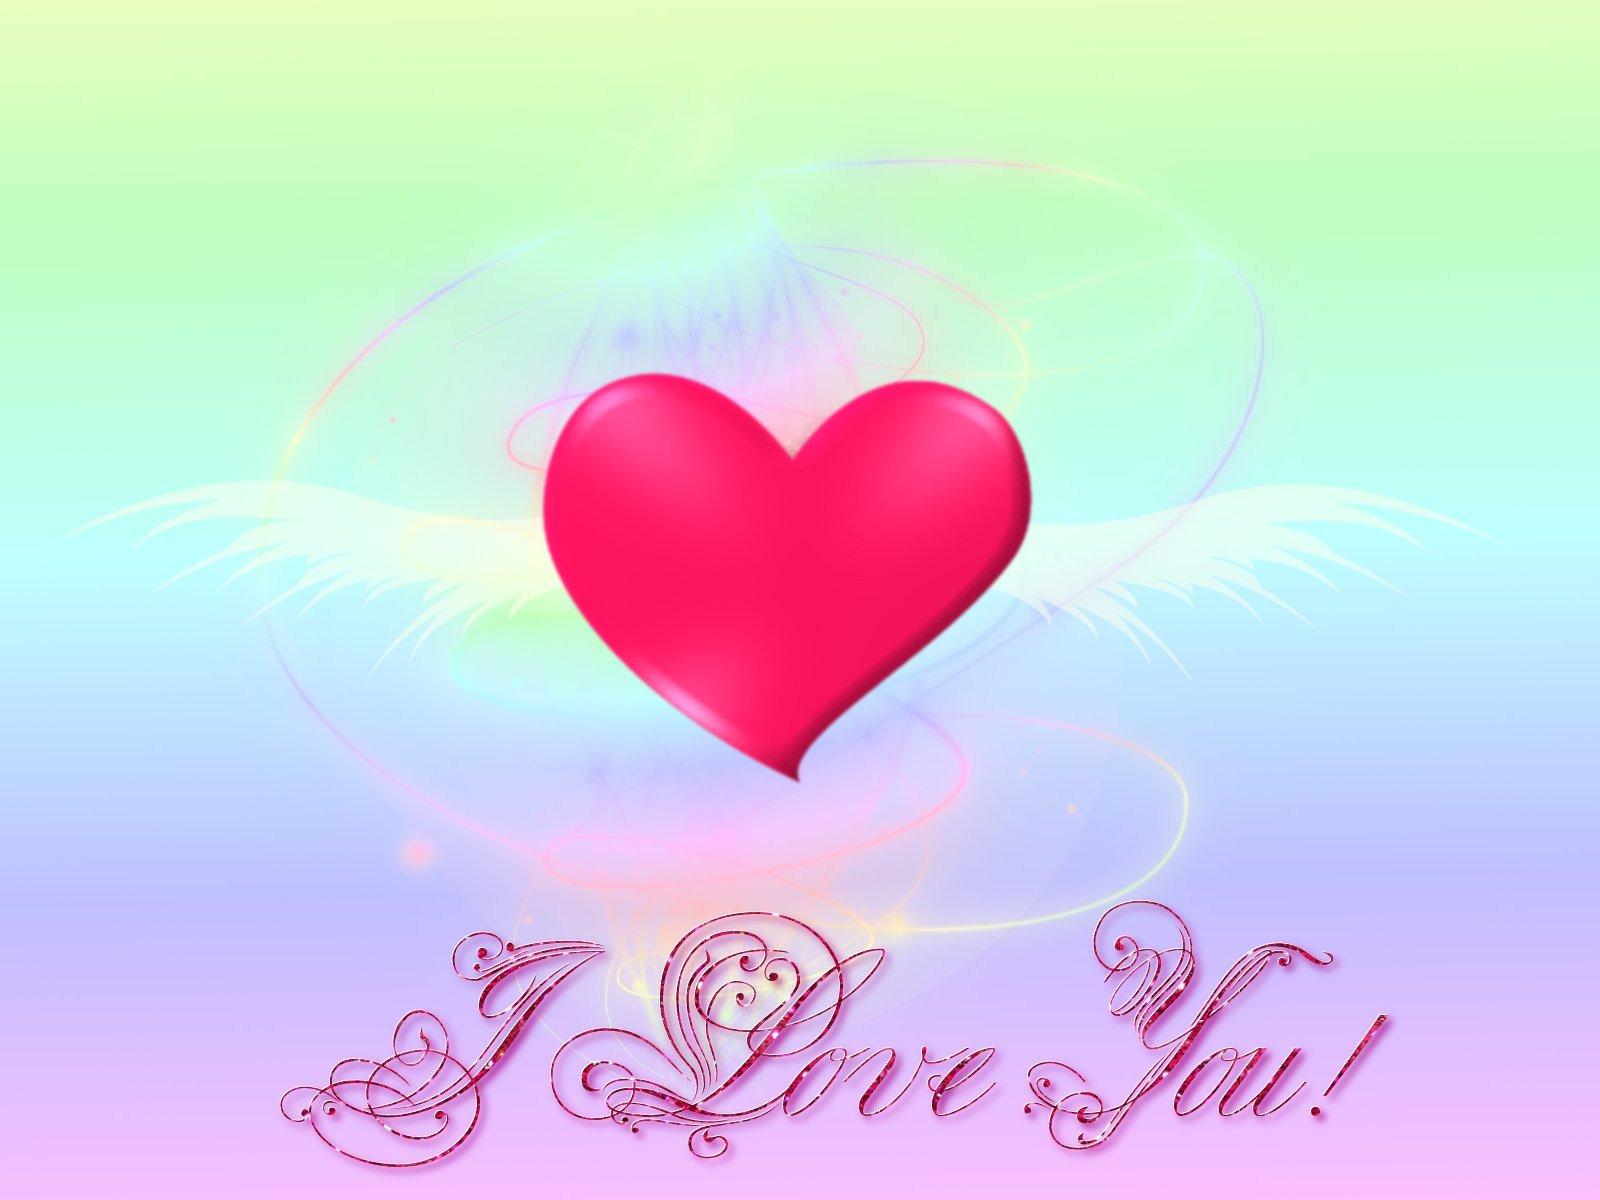 Fractal Love You Wallpapers - Love You Wallpaper Desktop , HD Wallpaper & Backgrounds